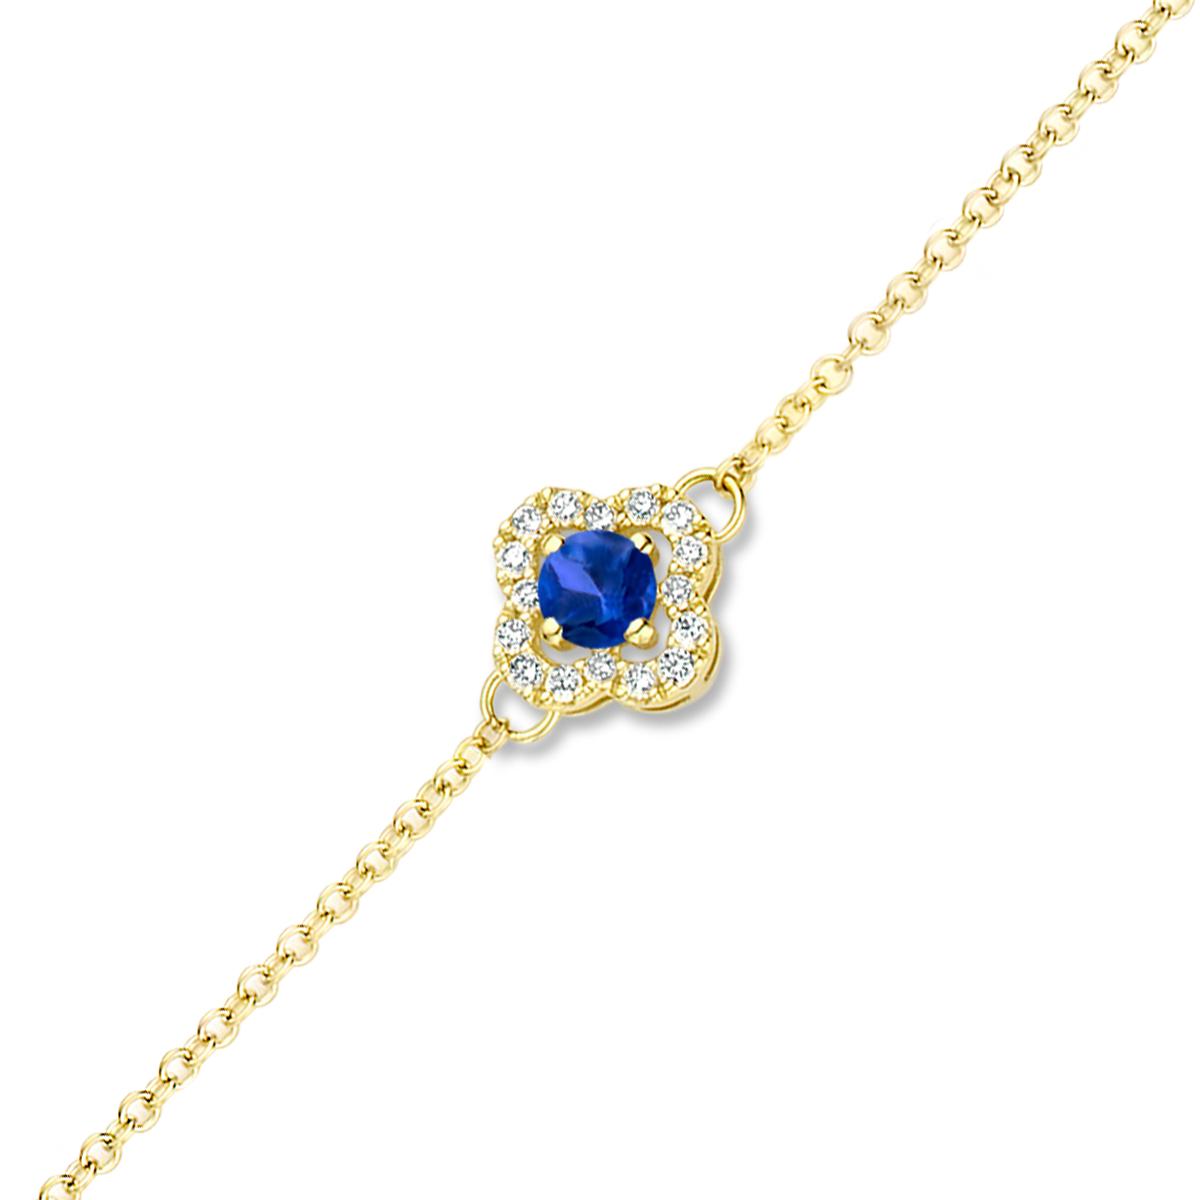 salina bracelet in yellow gold